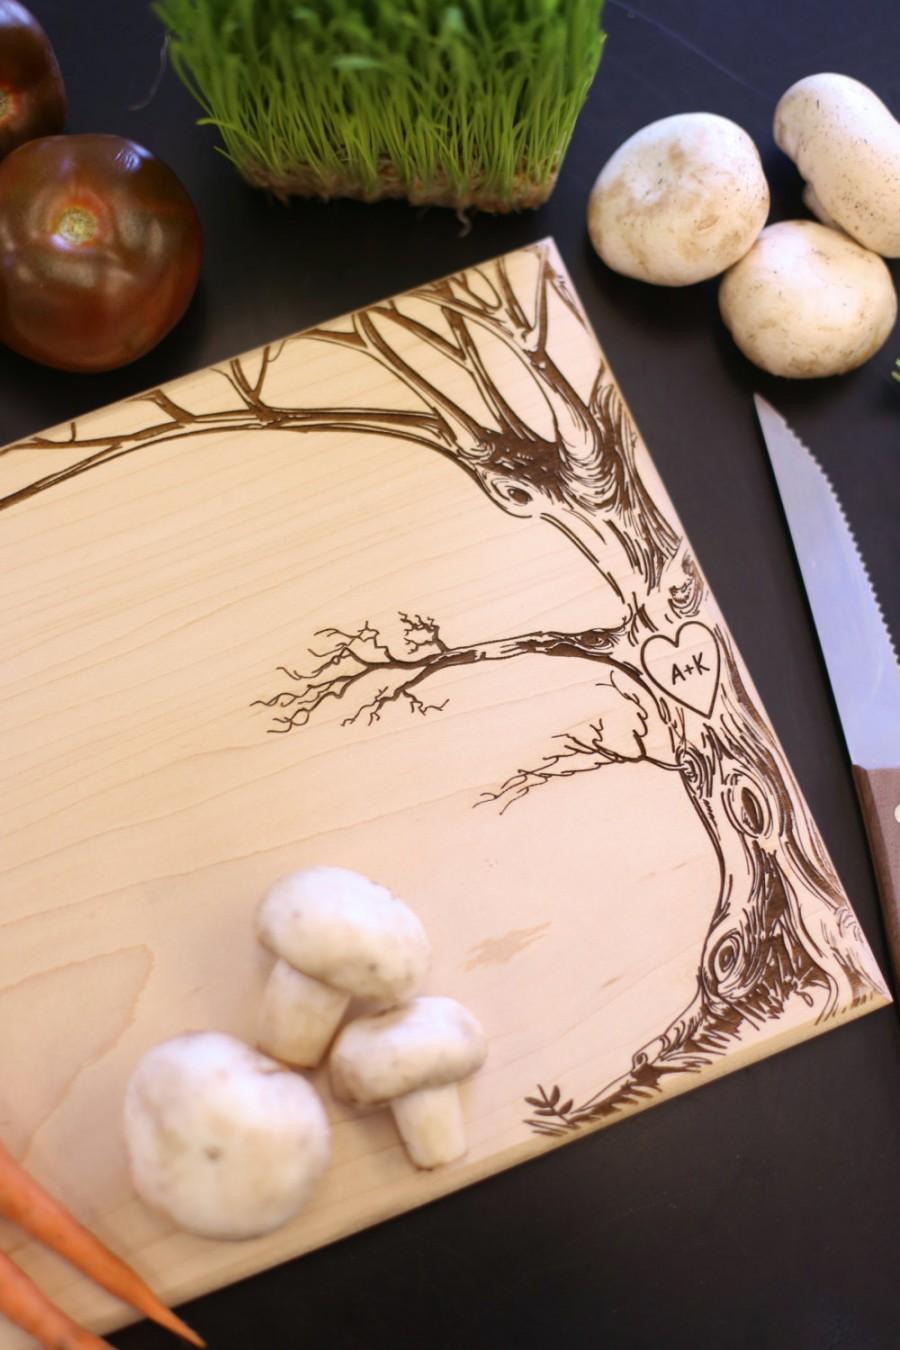 زفاف - Personalized Cutting Board Christmas Gift Bridal Shower Gift Wedding Gift Engraved Love Tree With Initials (Item Number MHD20012)